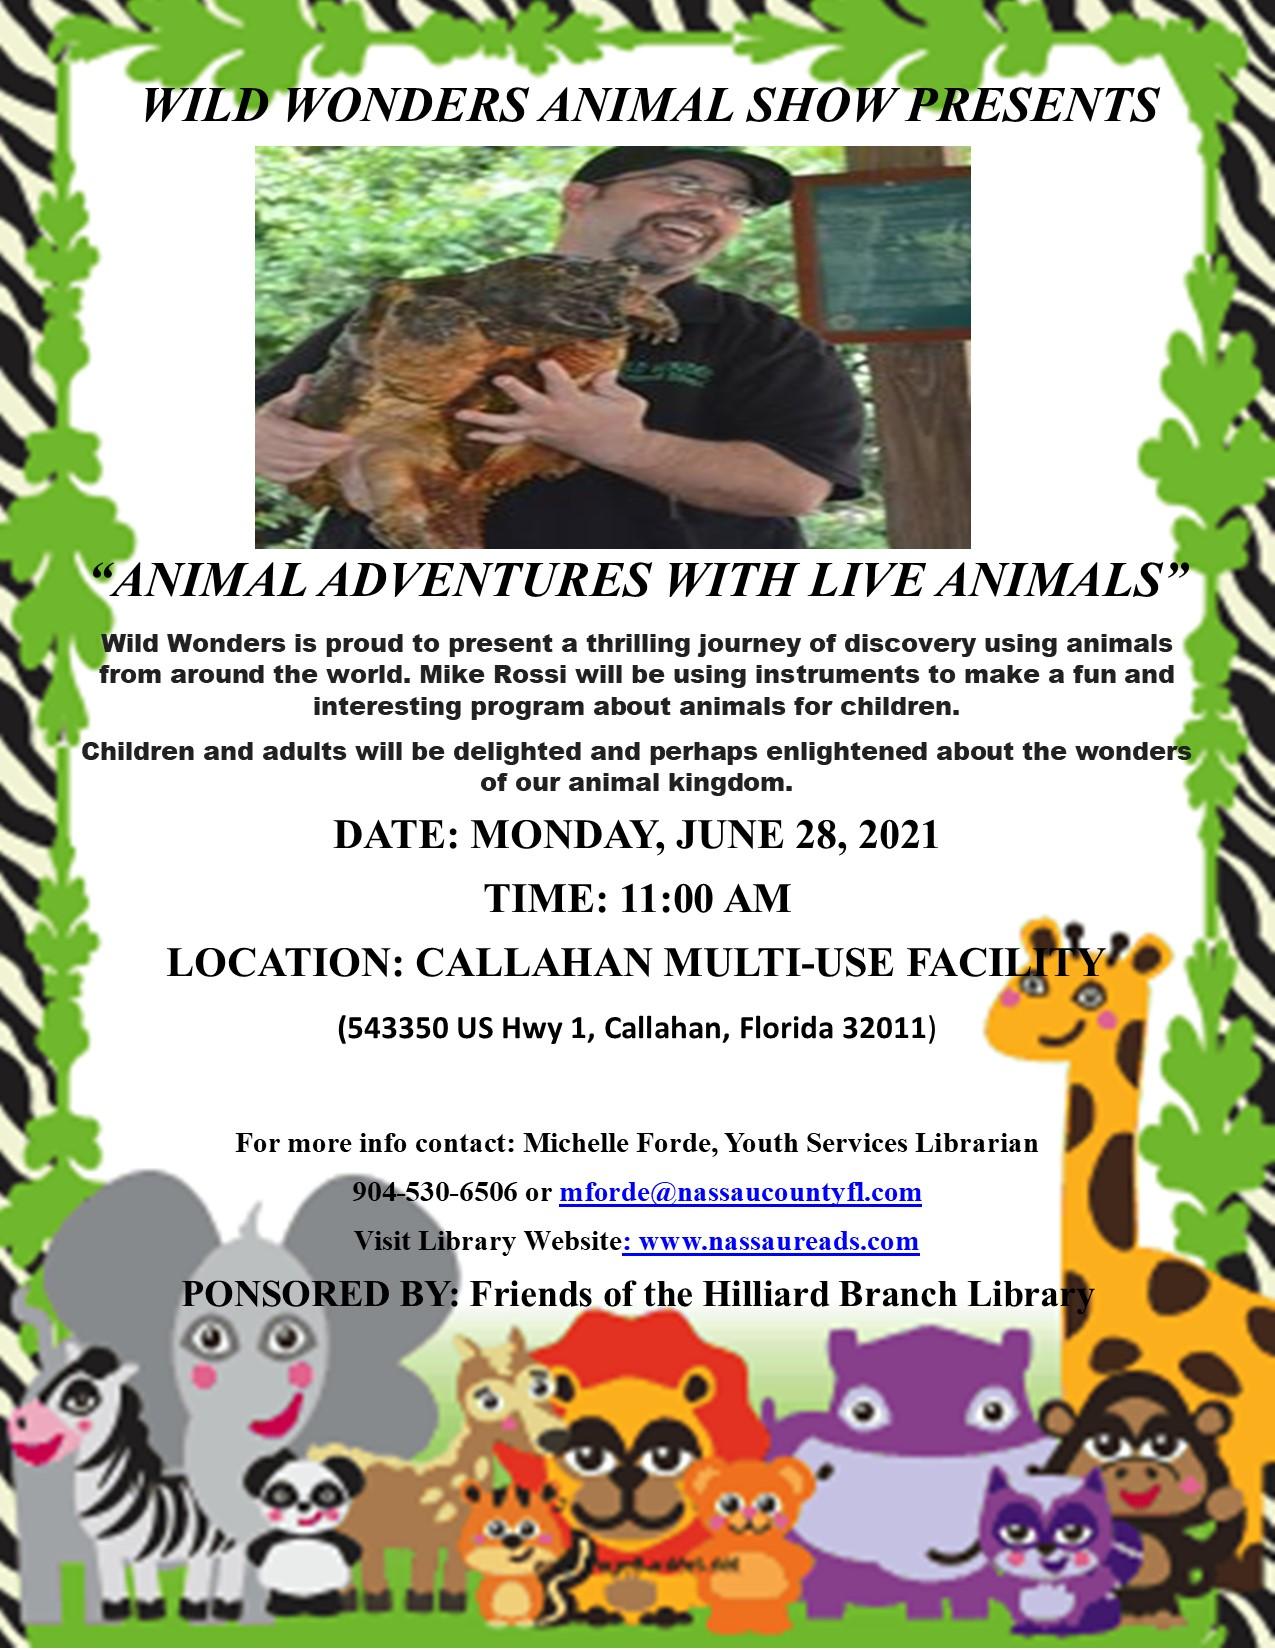 June 28 Wild Wonders Animal Show